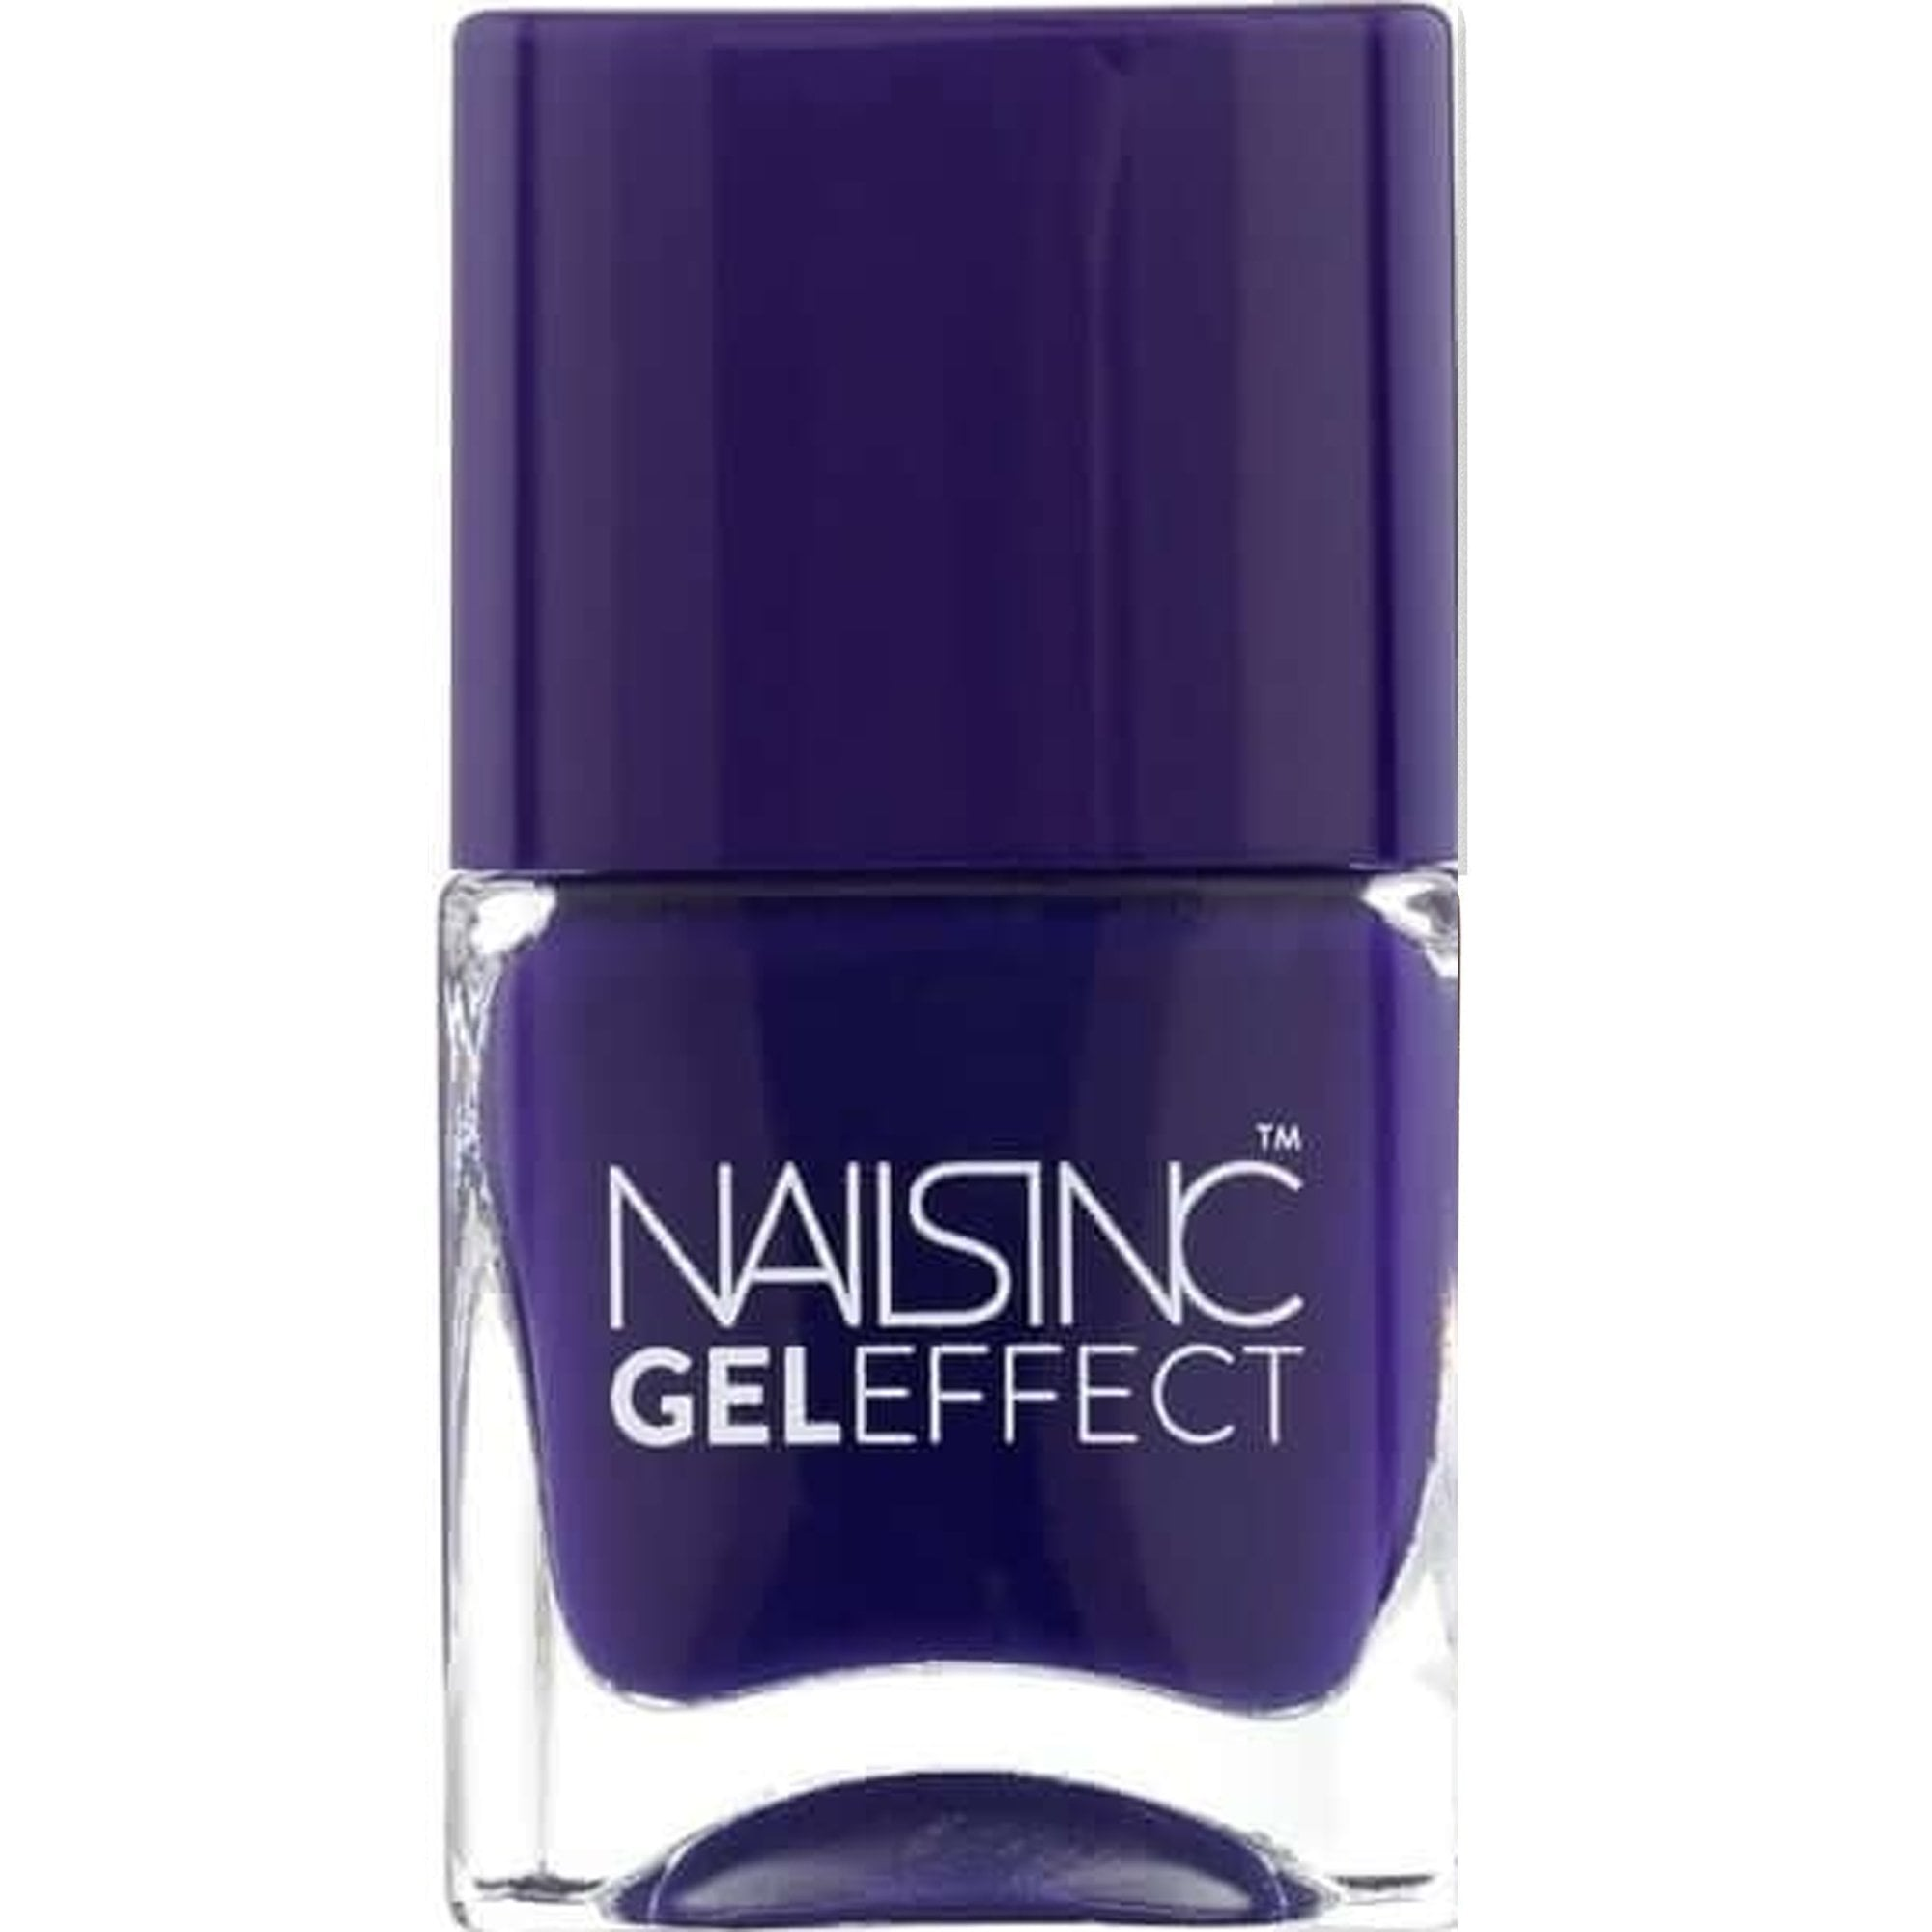 Nail Polish Gel Effect - Old Bond Street (6913) 14ml